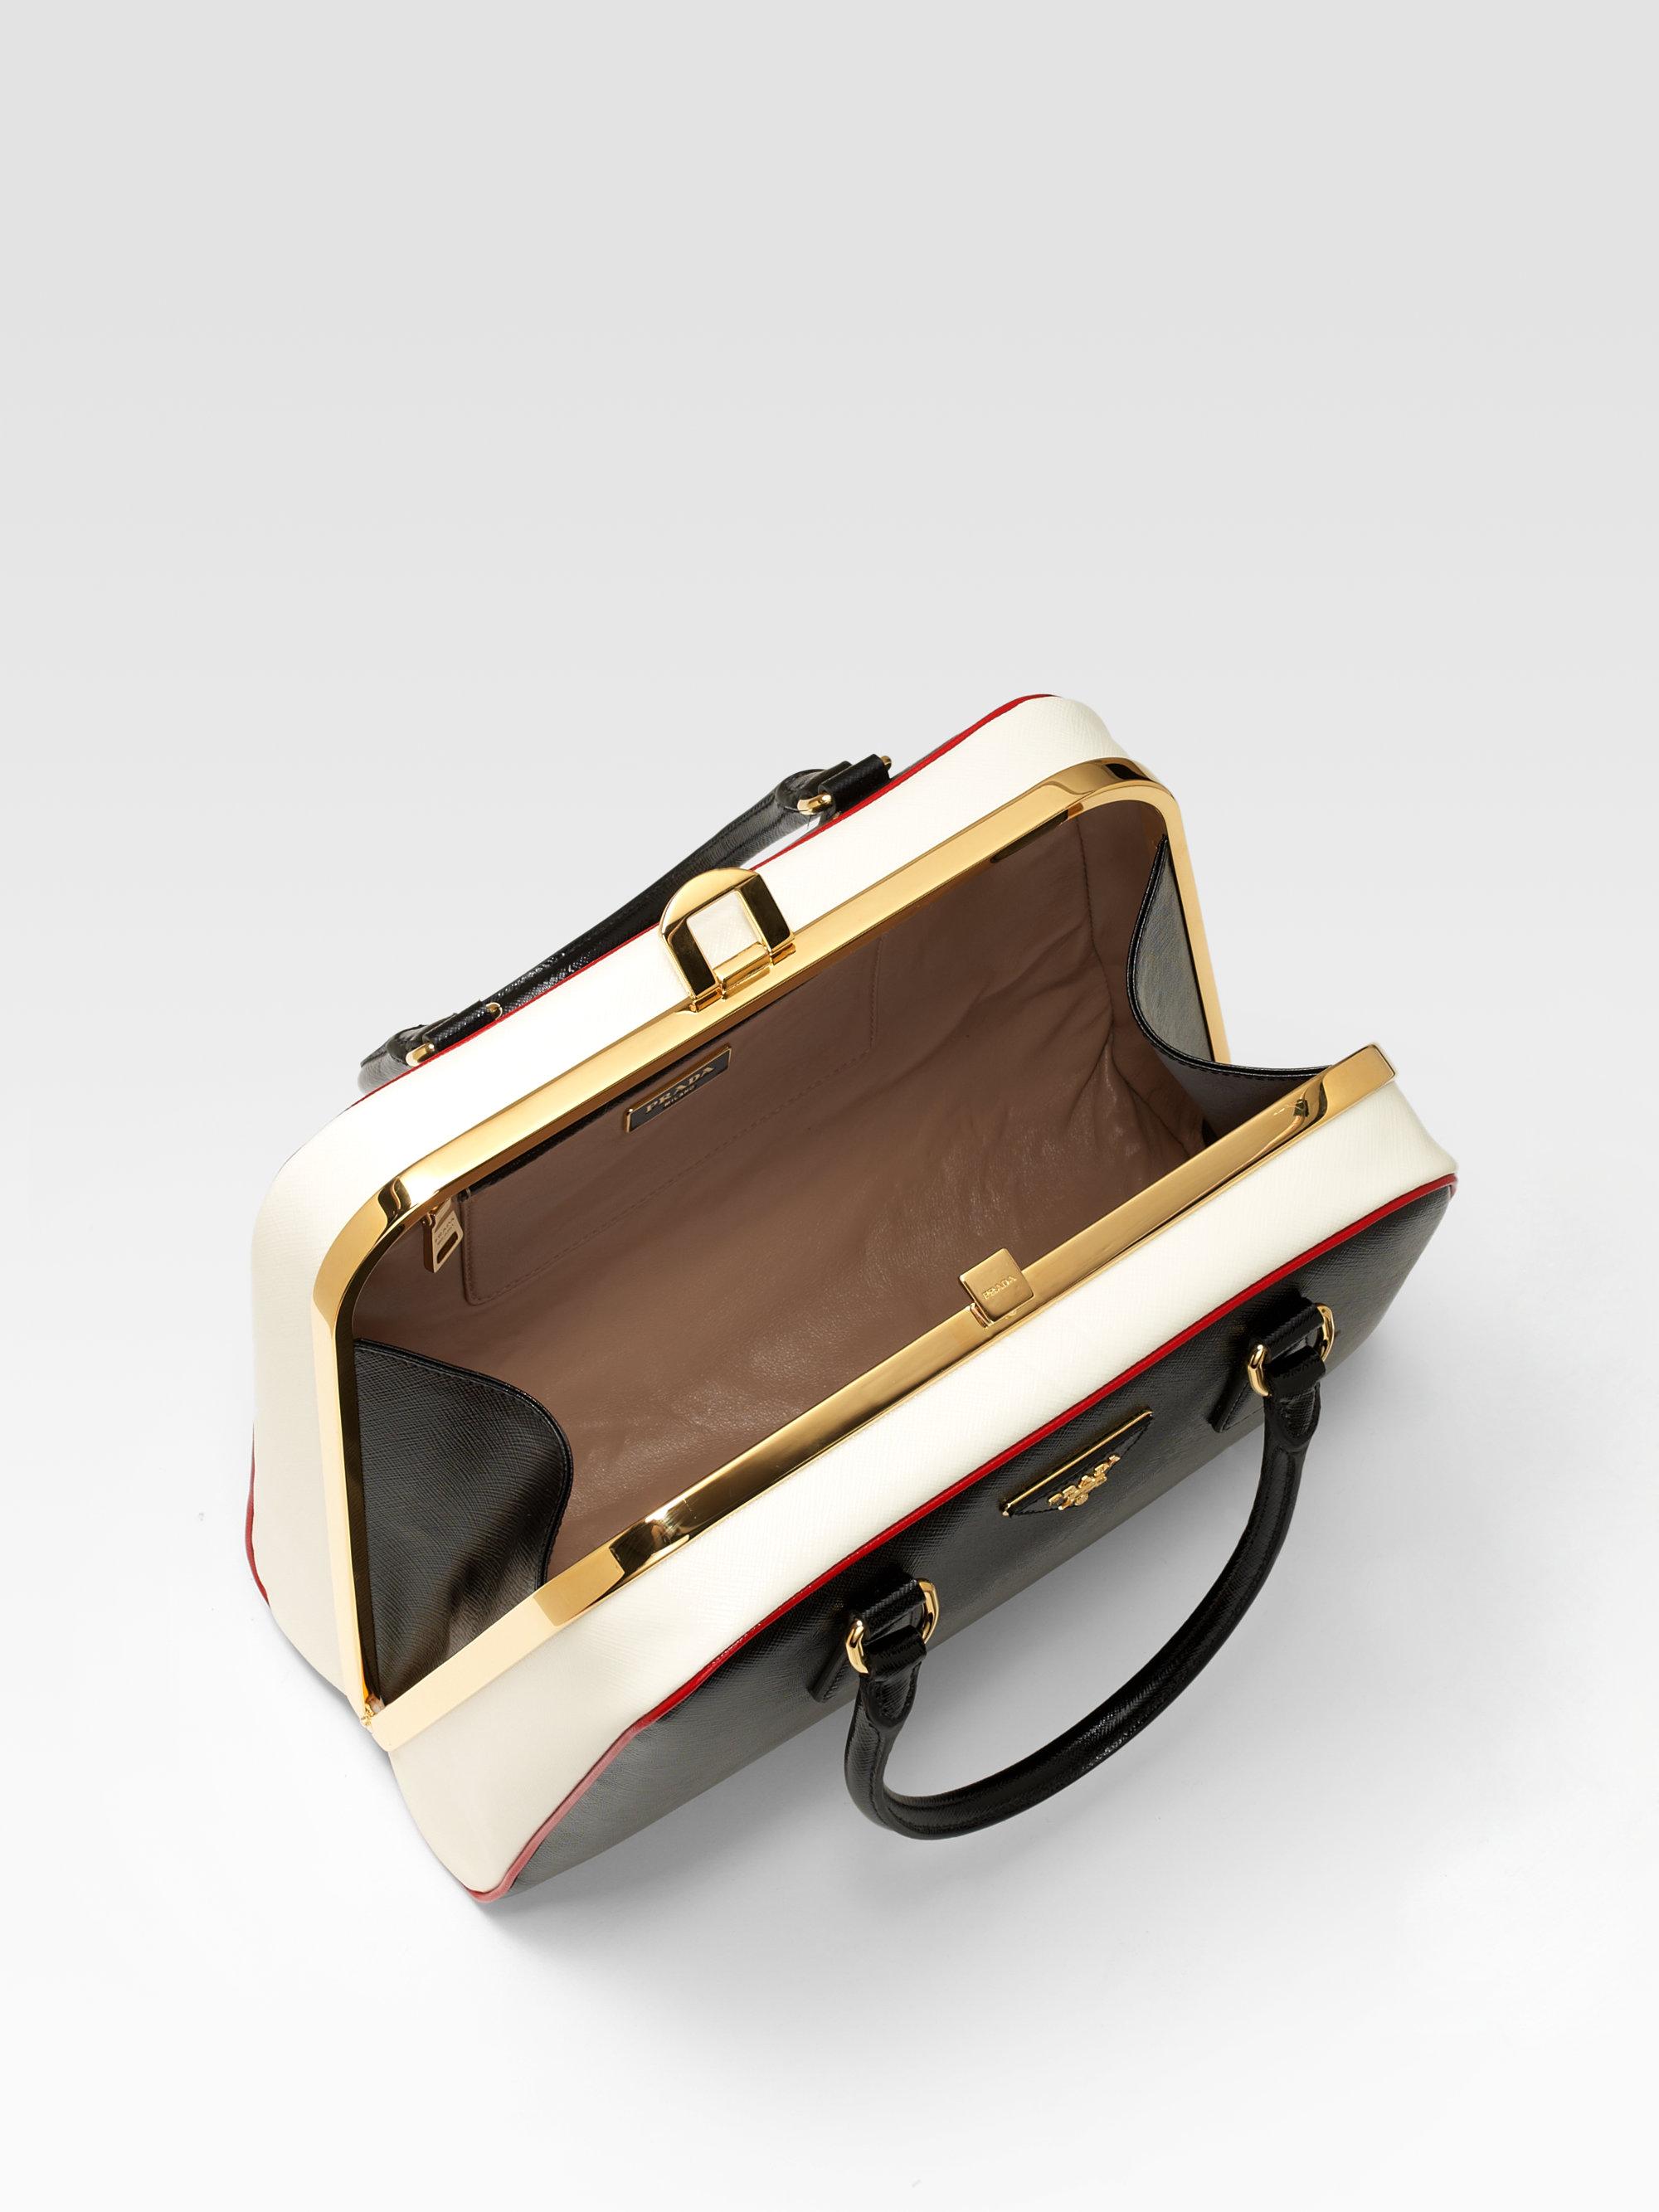 prada replica bags - authentic cheap prada wallet